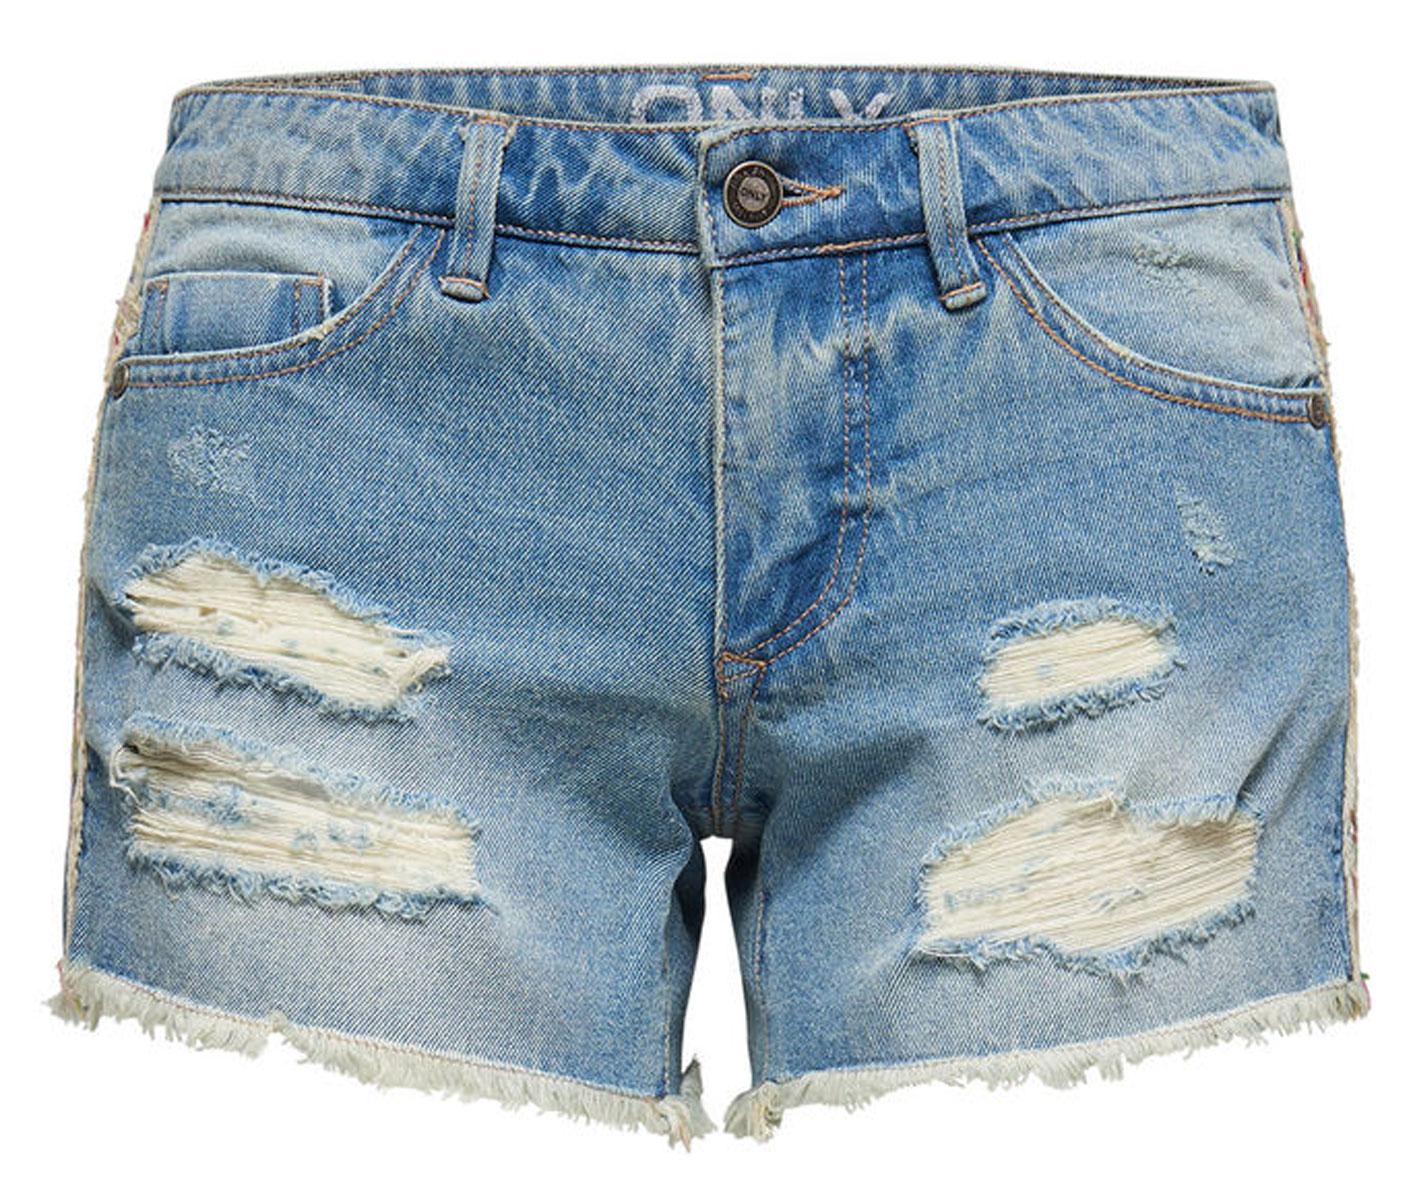 Шорты женские Only, цвет: синий. 15134624_Light Blue Denim. Размер 27 (42/44) шорты женские only цвет синий 15134356